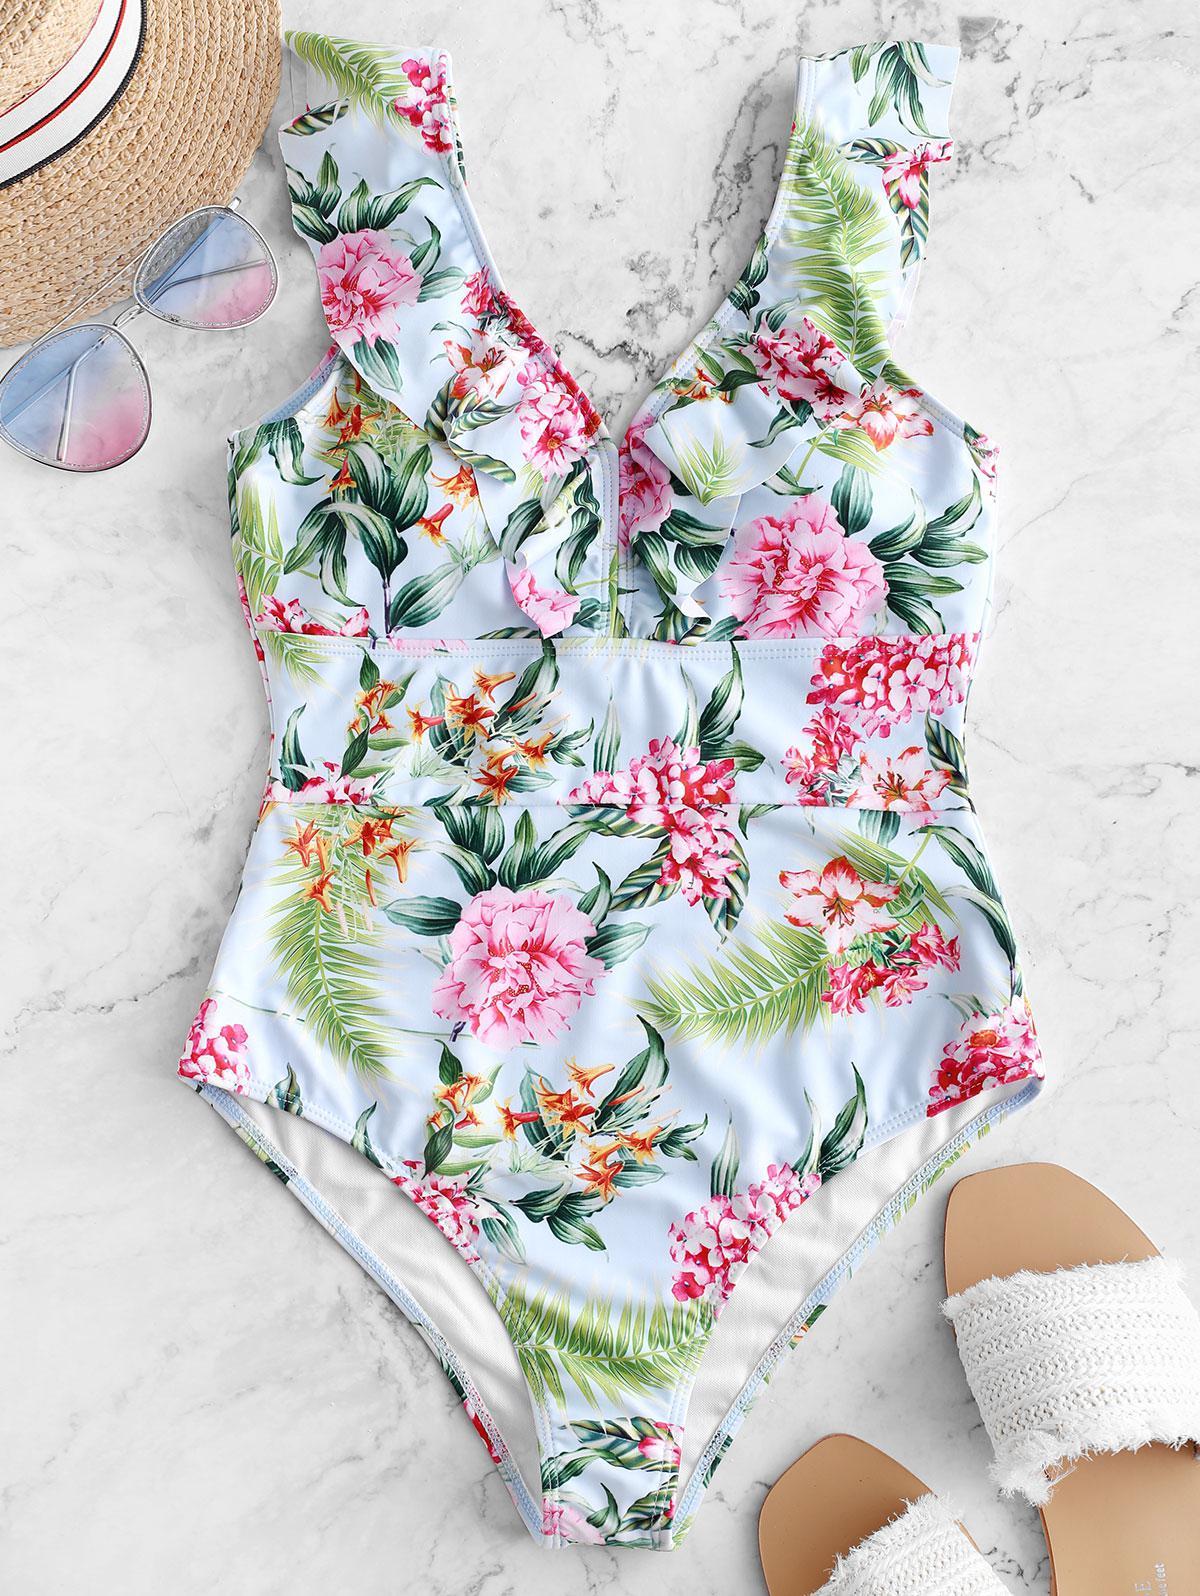 ZAFUL Flower Leaf Print Ruffle Plunging Swimsuit, Multi-a